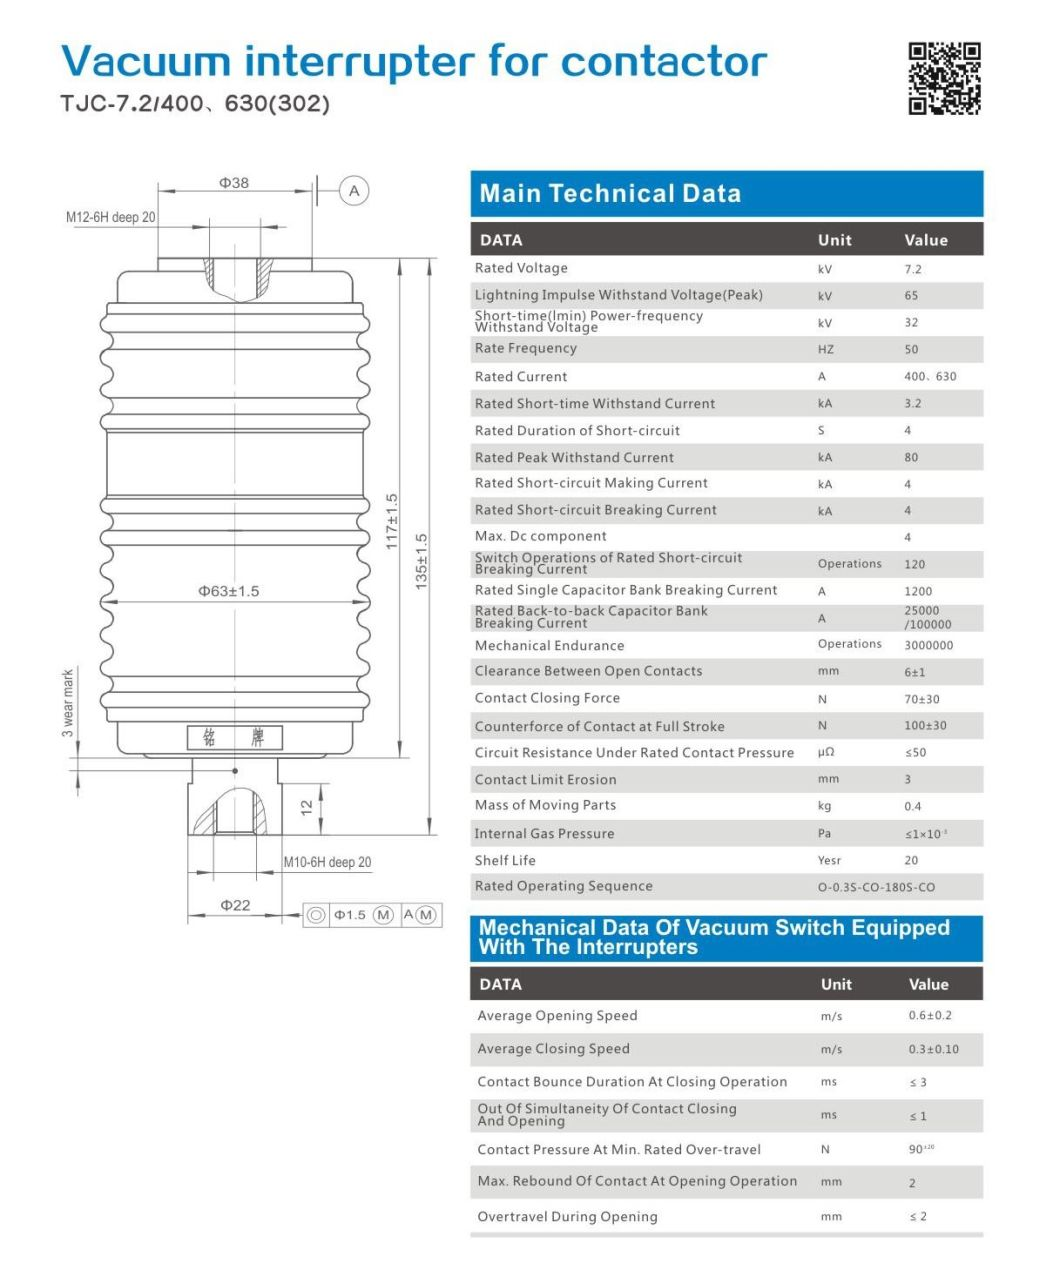 Vacuum Interrupter for Vcb Tjc-7.2/600 (302)